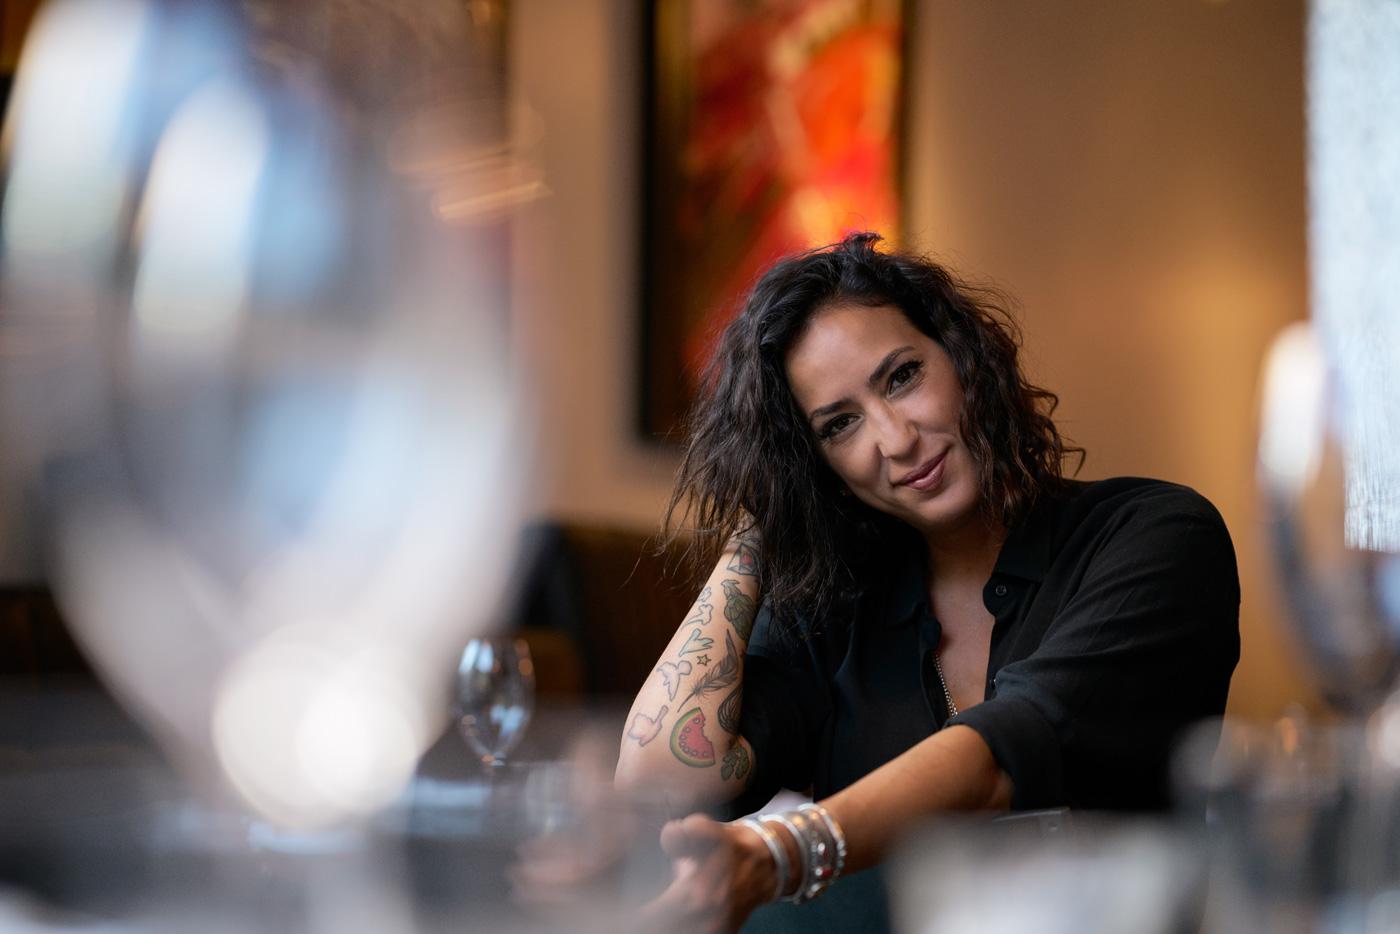 Kimberly Lallouz cheff portrait montreal